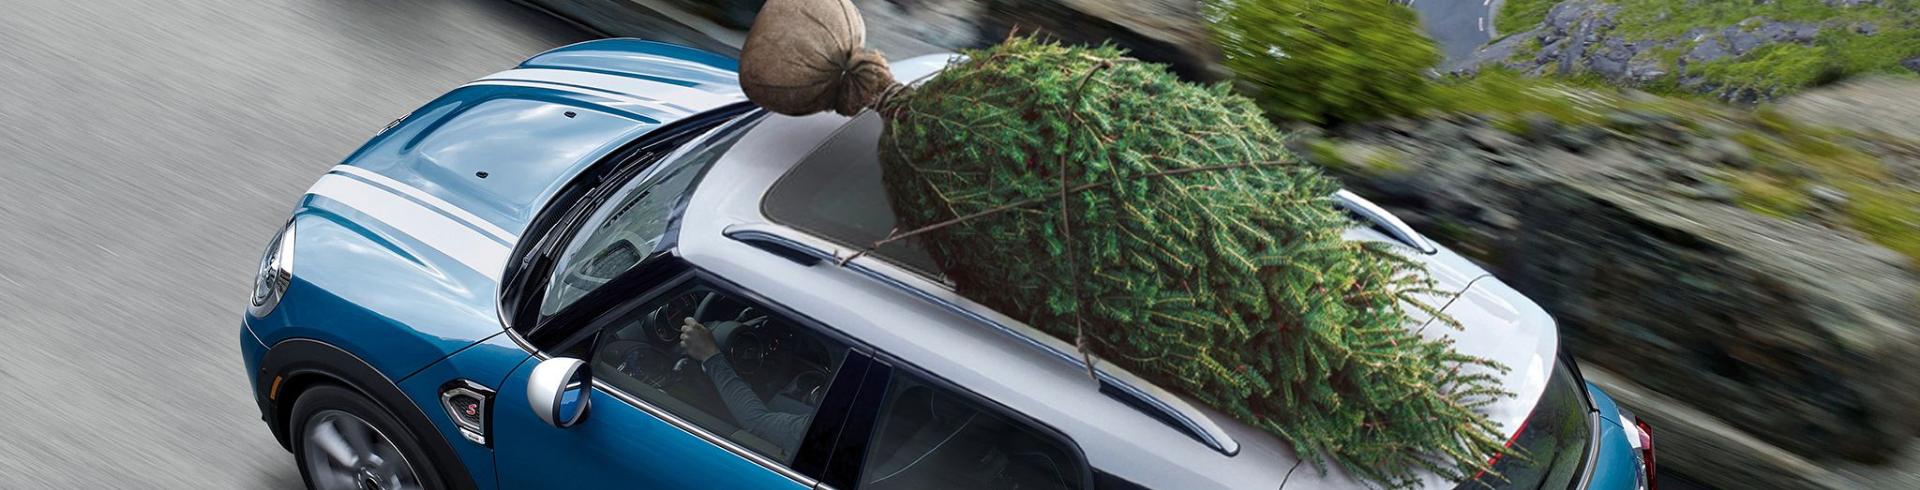 MINI Countryman Christmas Tree On Roof